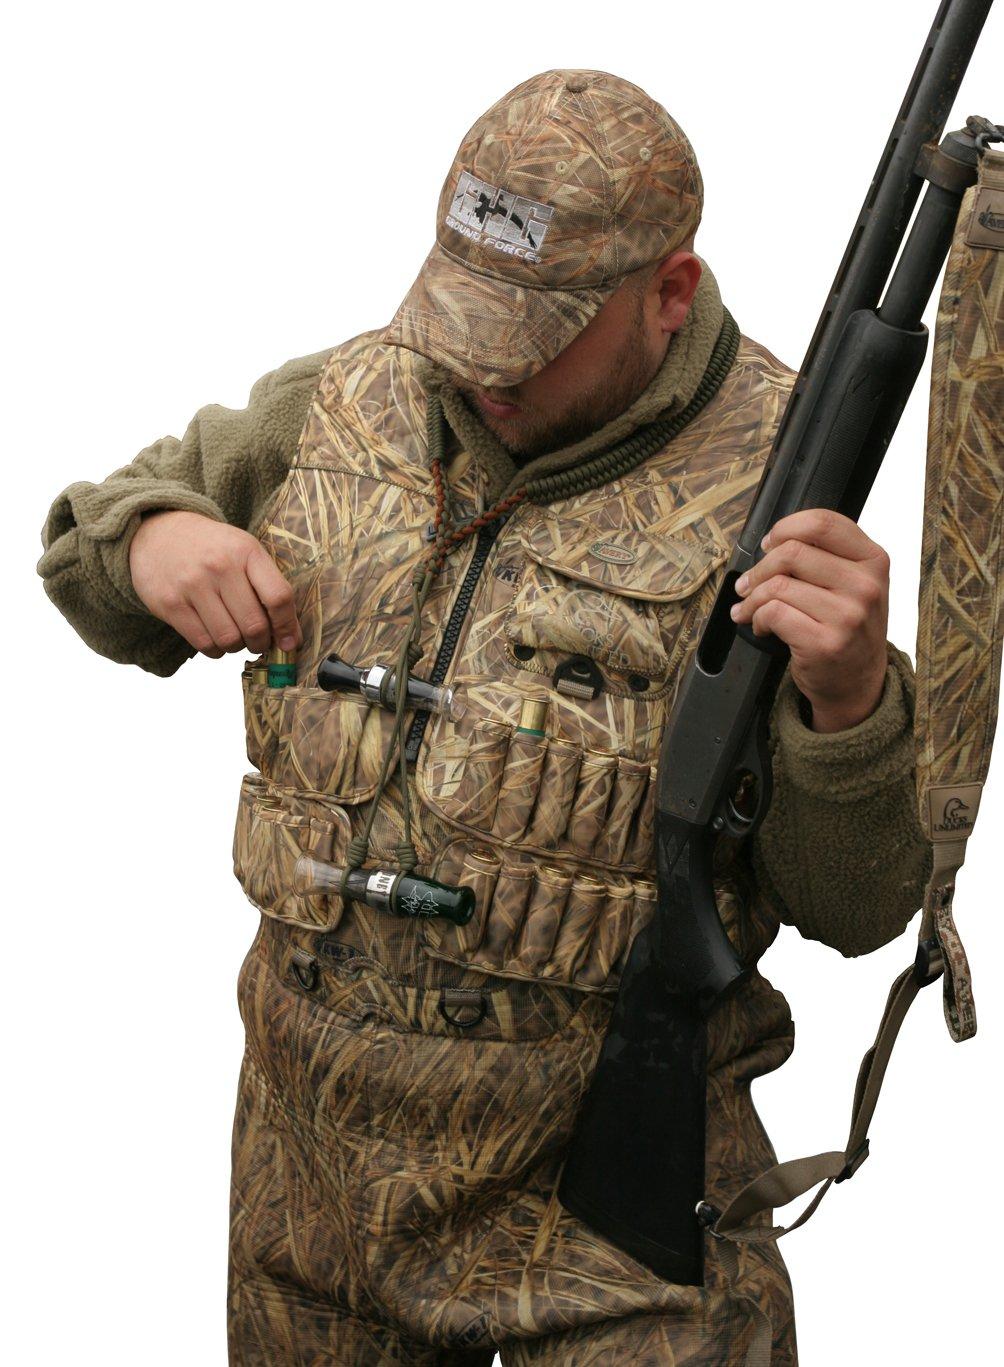 e62d761f84e14 Avery Outdoors Ducks Unlimited Series Killer Weed Camo Neoprene Wading Vest:  Amazon.ca: Sports & Outdoors